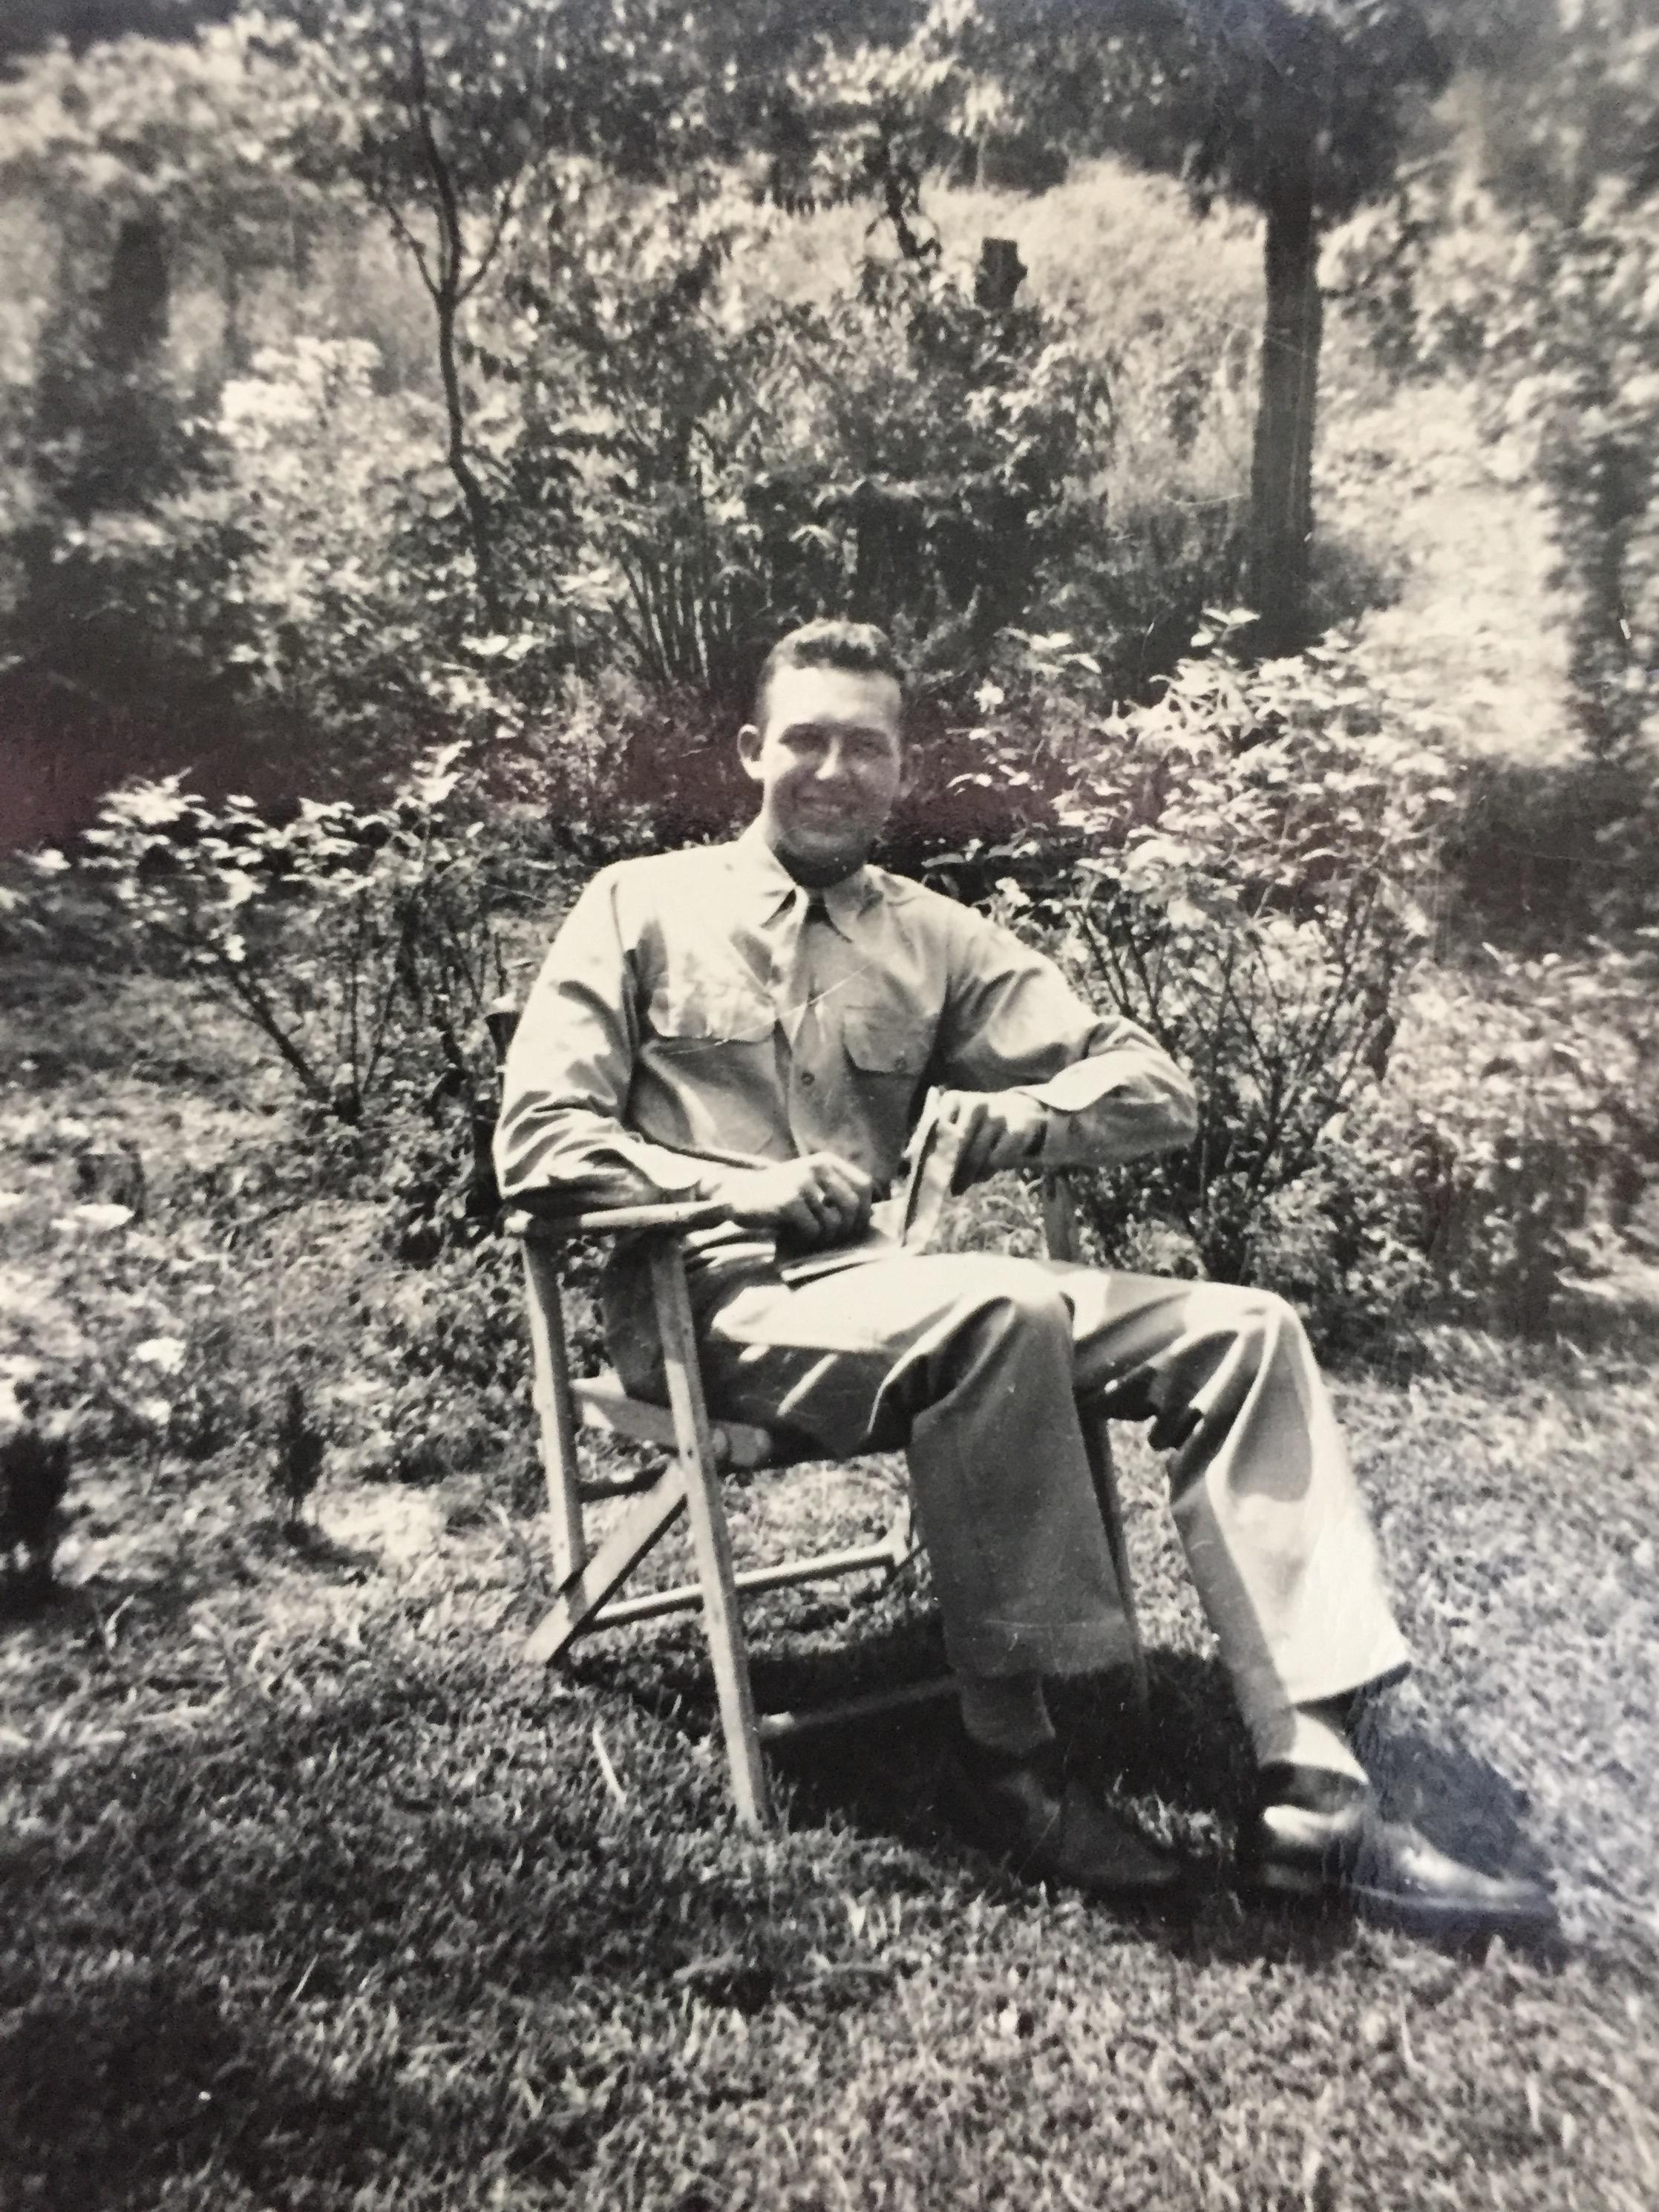 Gene hatfield in war uniform sitting in chair in yard 1944.jpg